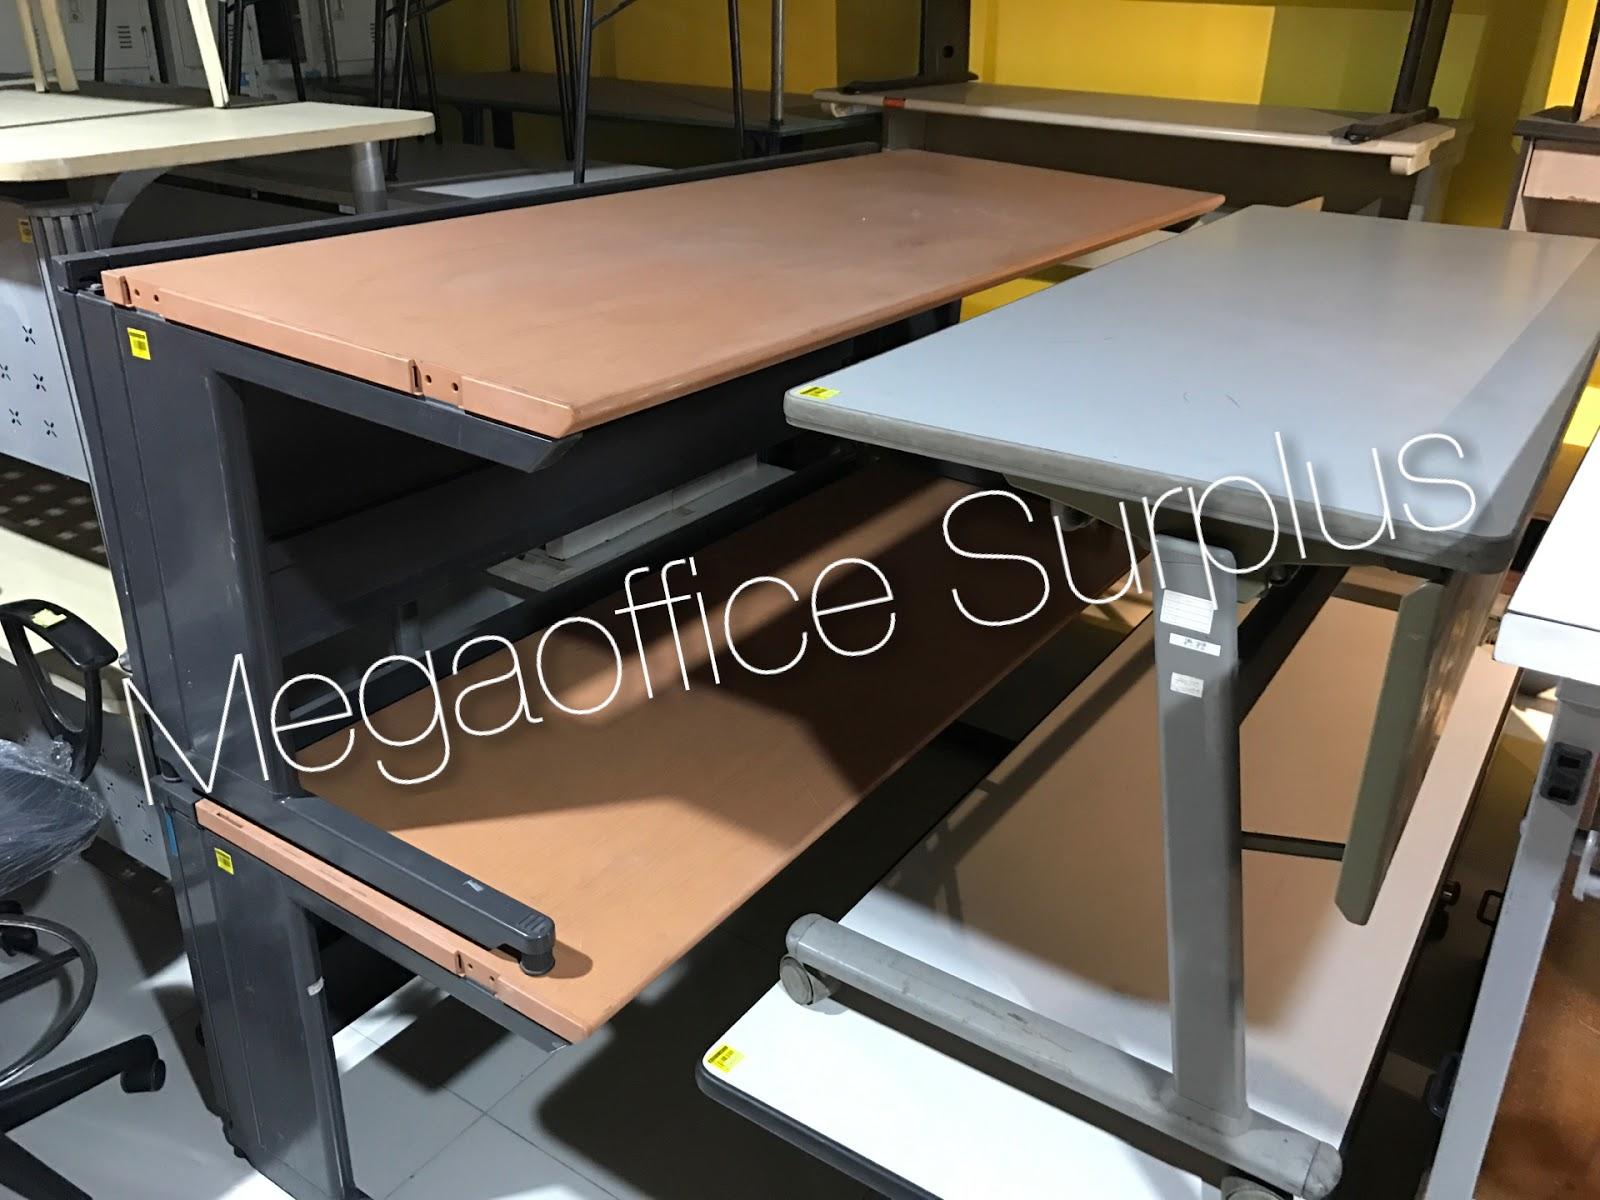 Japan Surplus Furniture For Sale In Dasmarinas Cavite